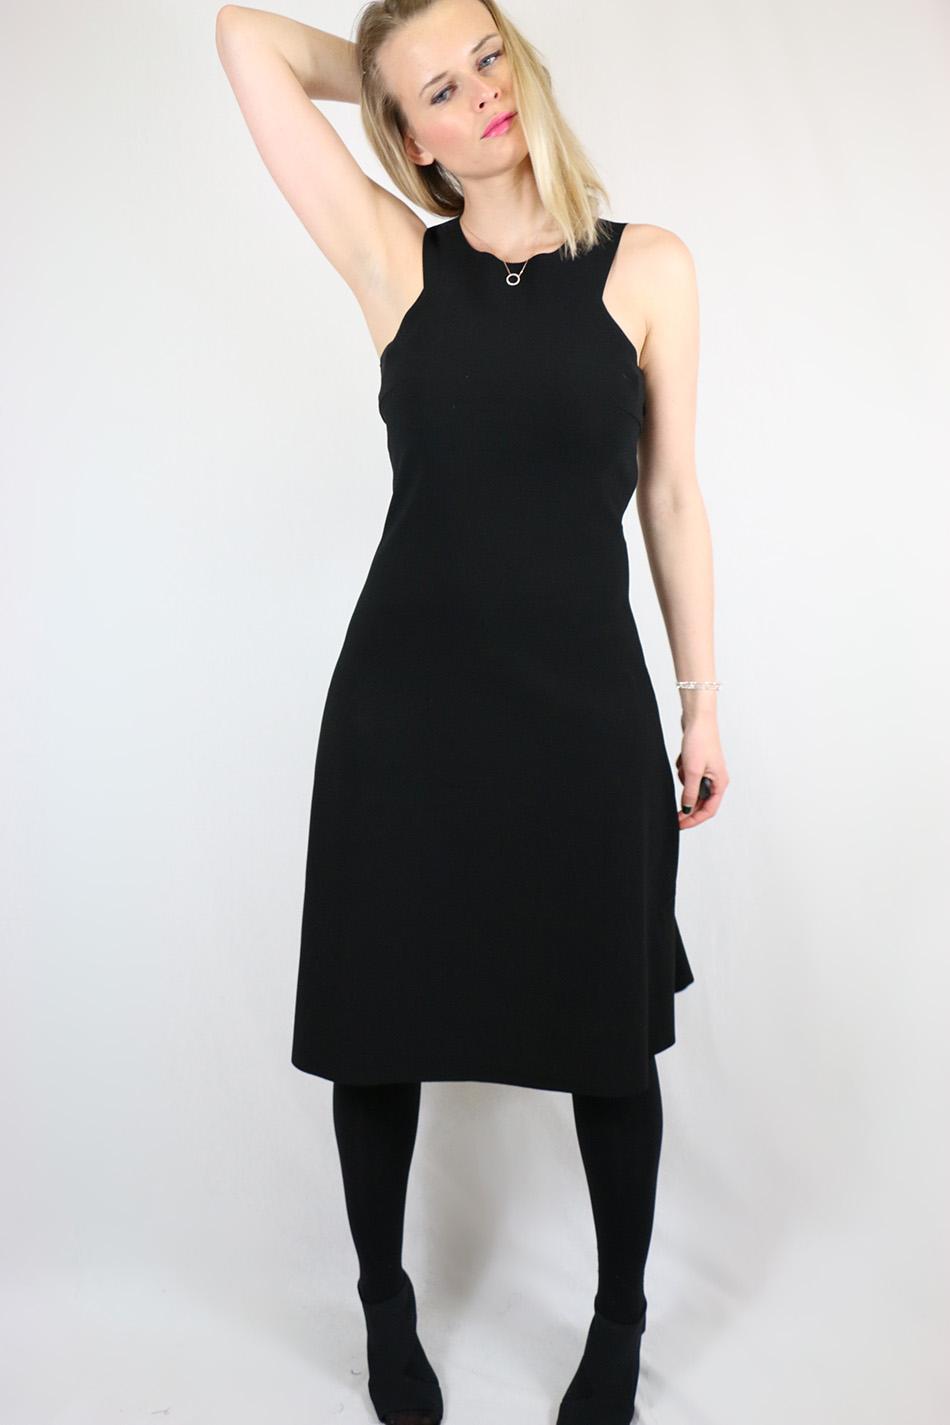 Fringe and Doll Black A-line dress IMG_1723